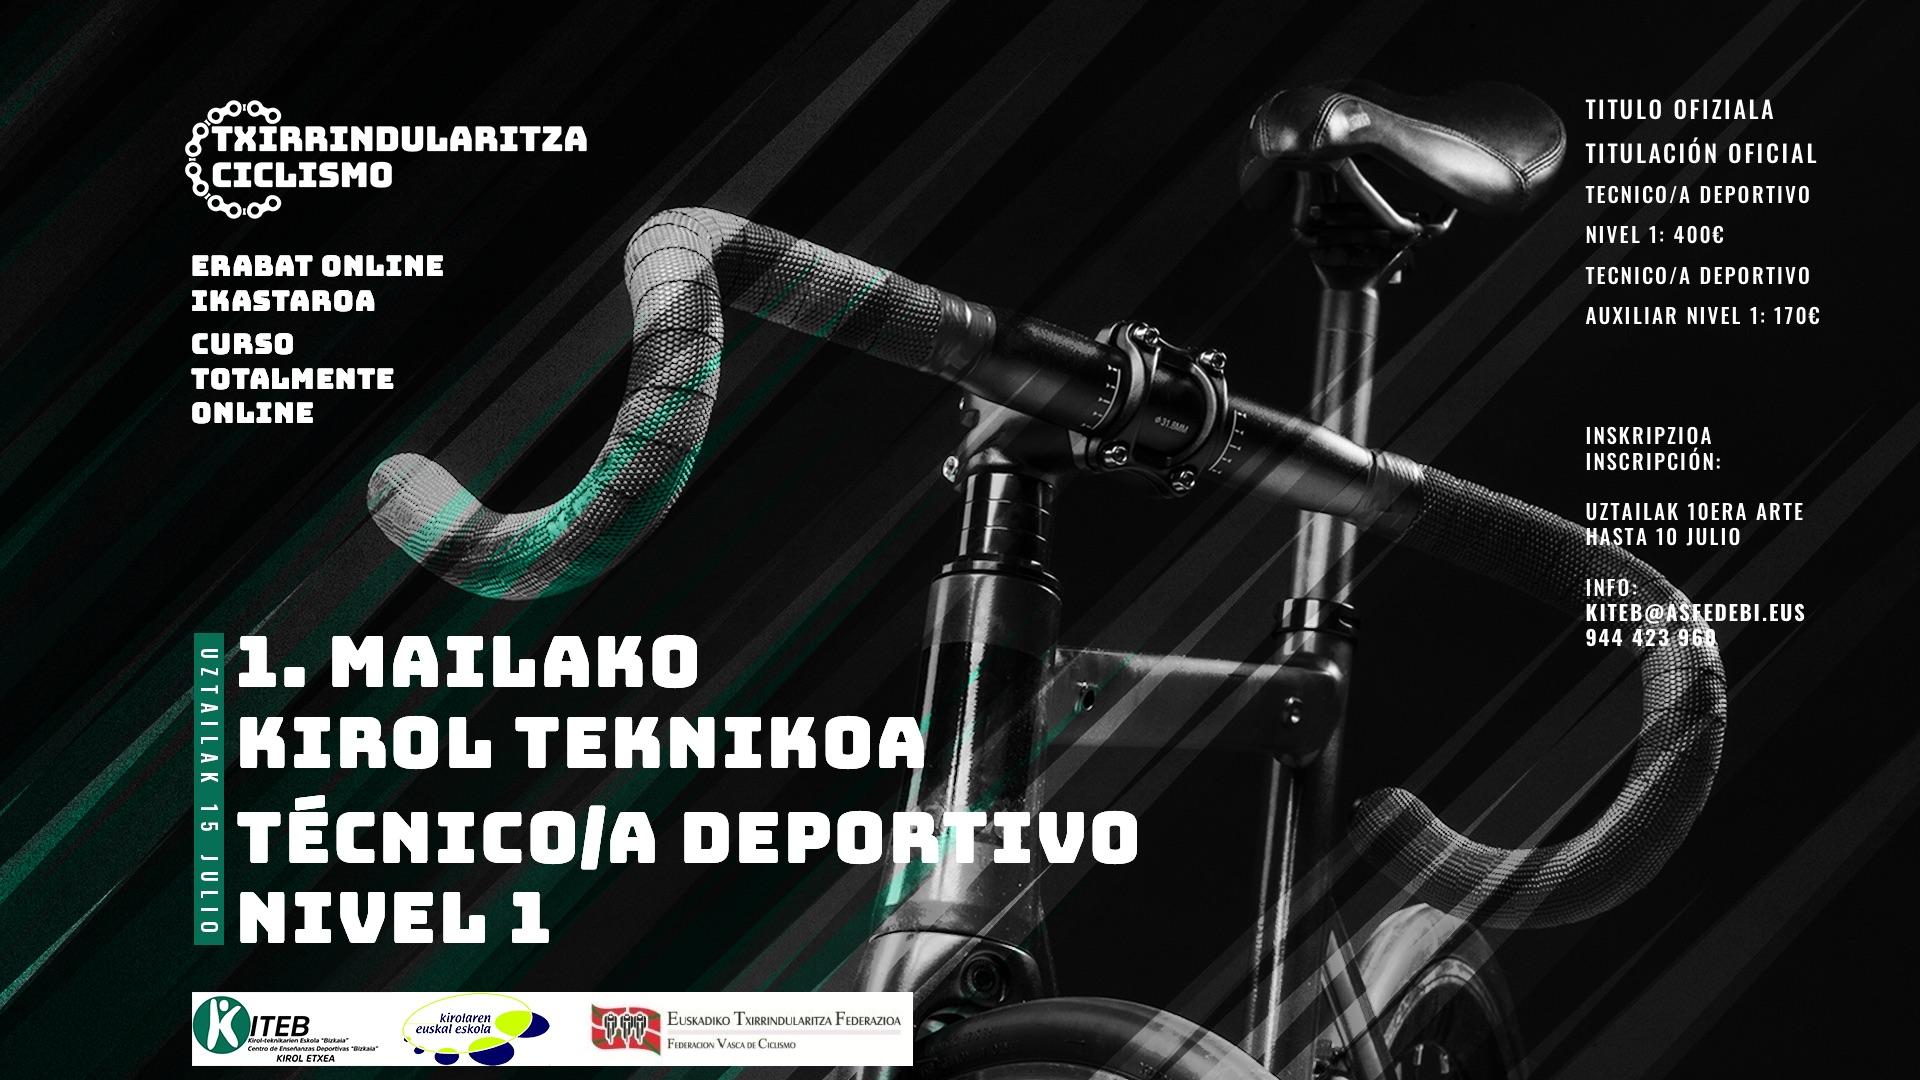 Curso de Técnico en Ciclismo Nivel 1